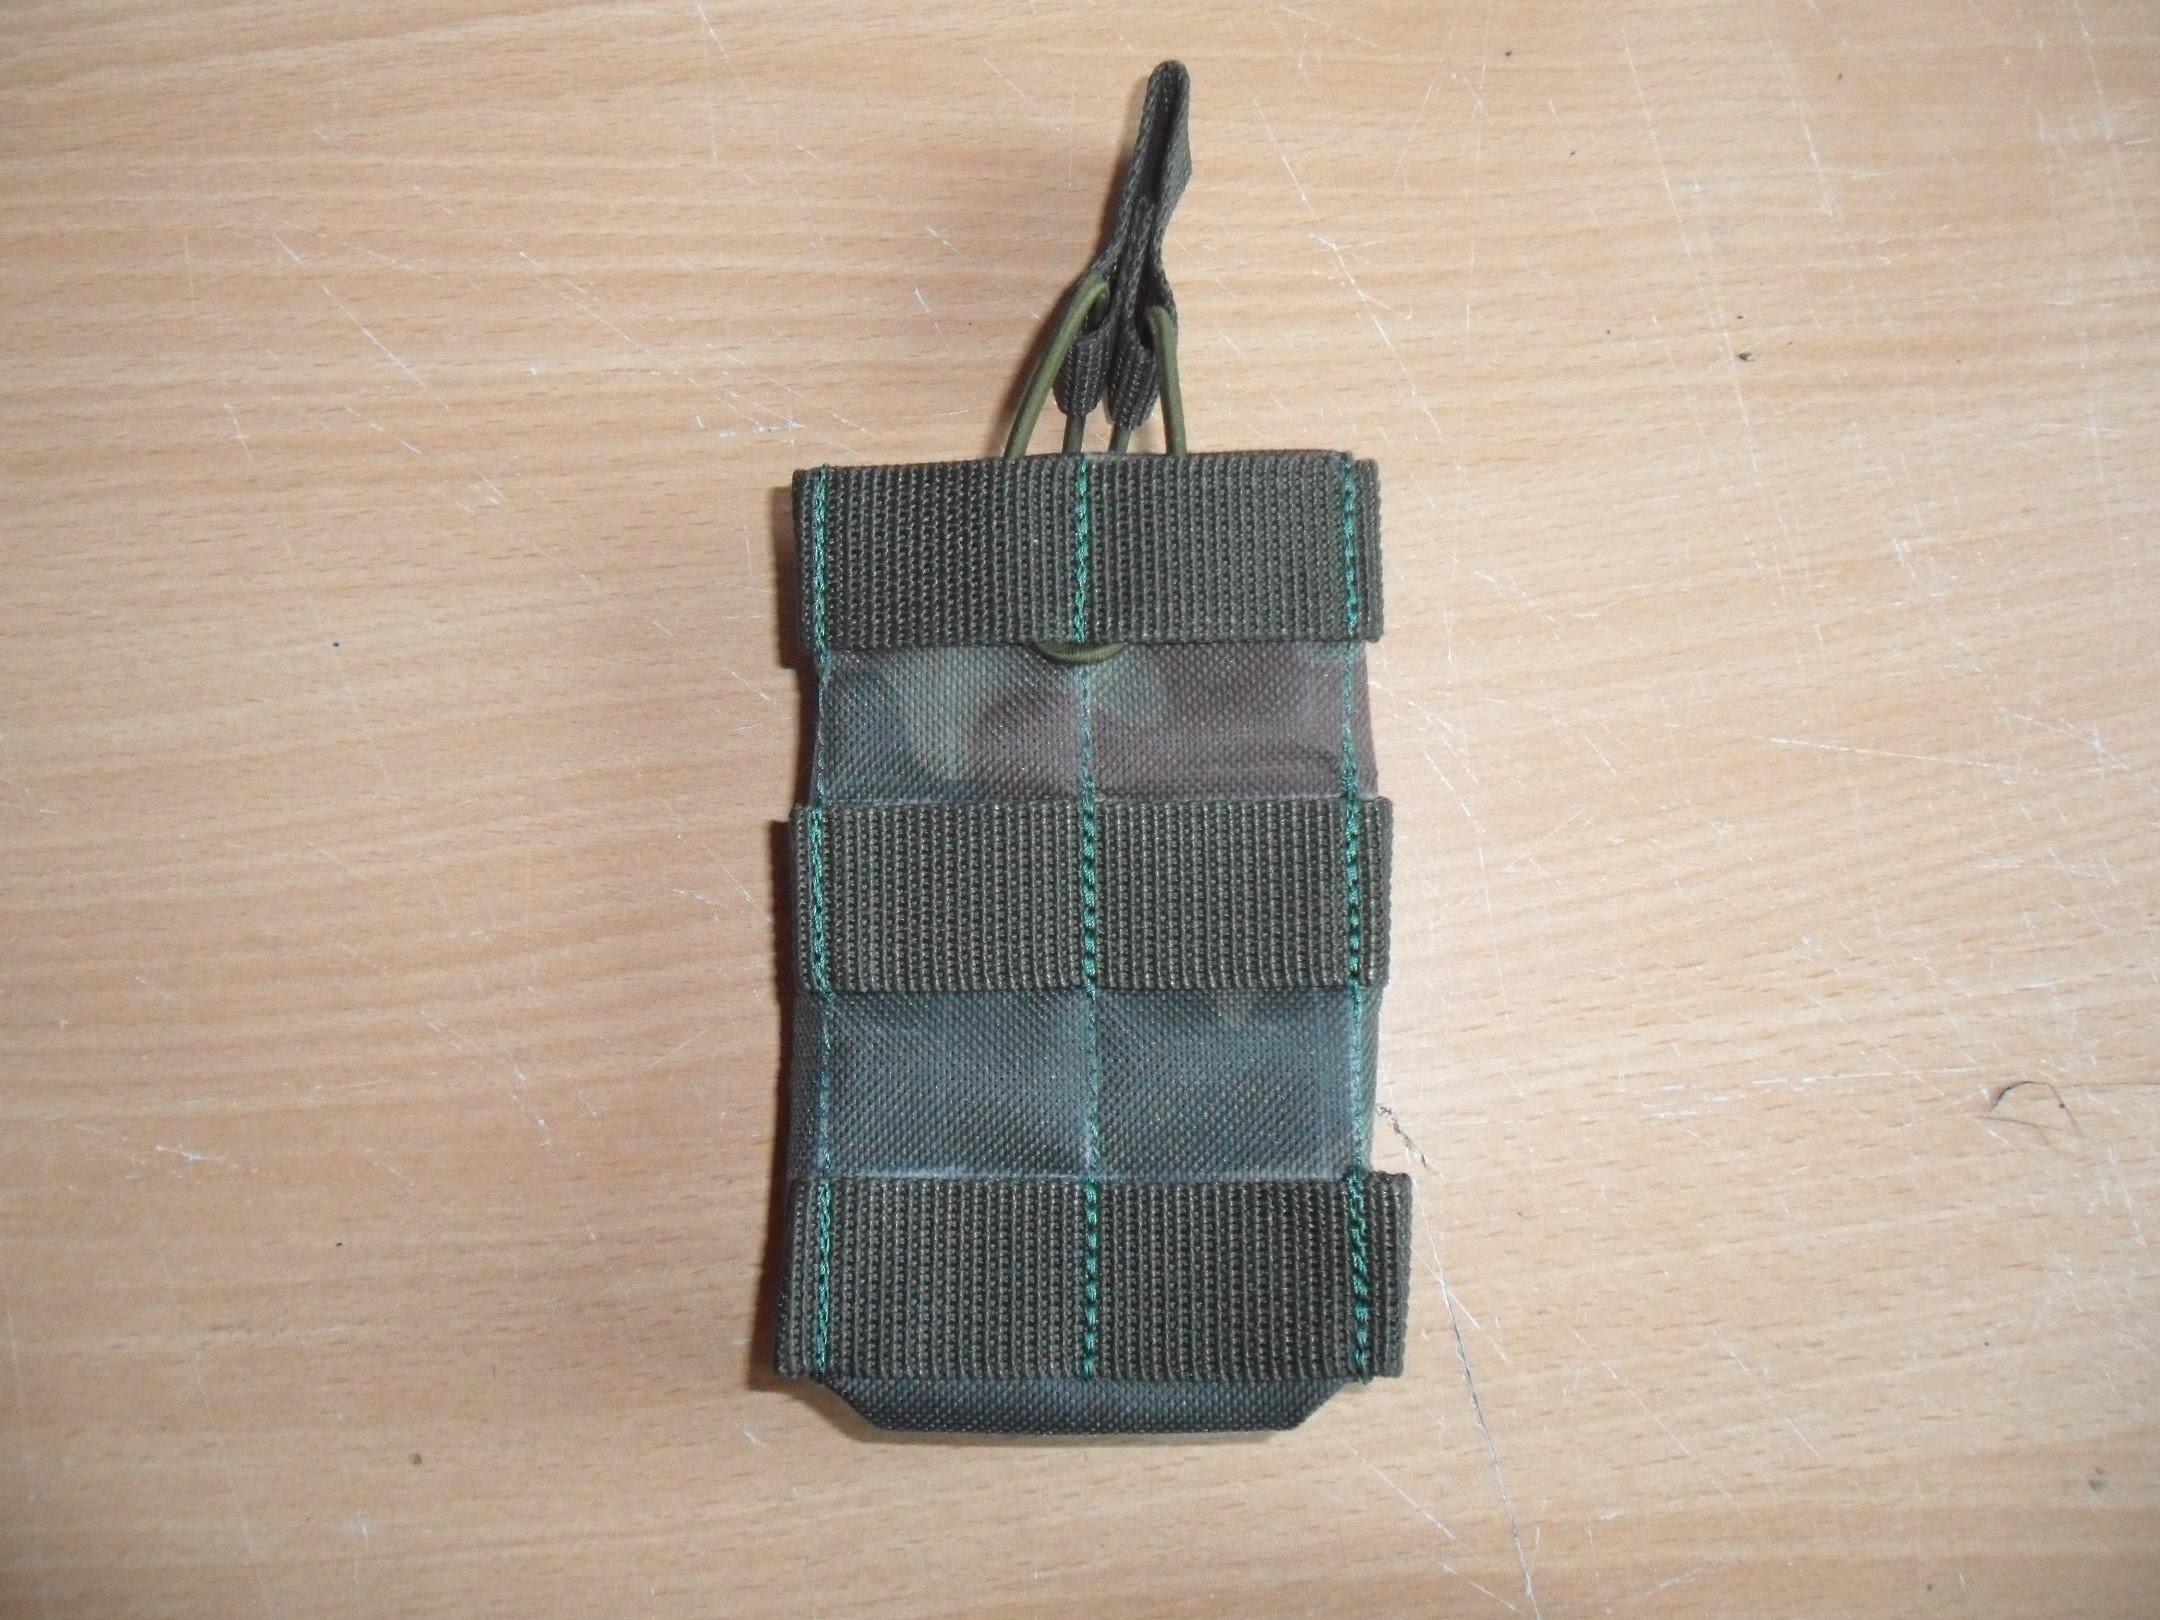 ŁADOWNICA SHINGLE M4 zrób to sam. DIY Shingle Mag Pouch single homemade